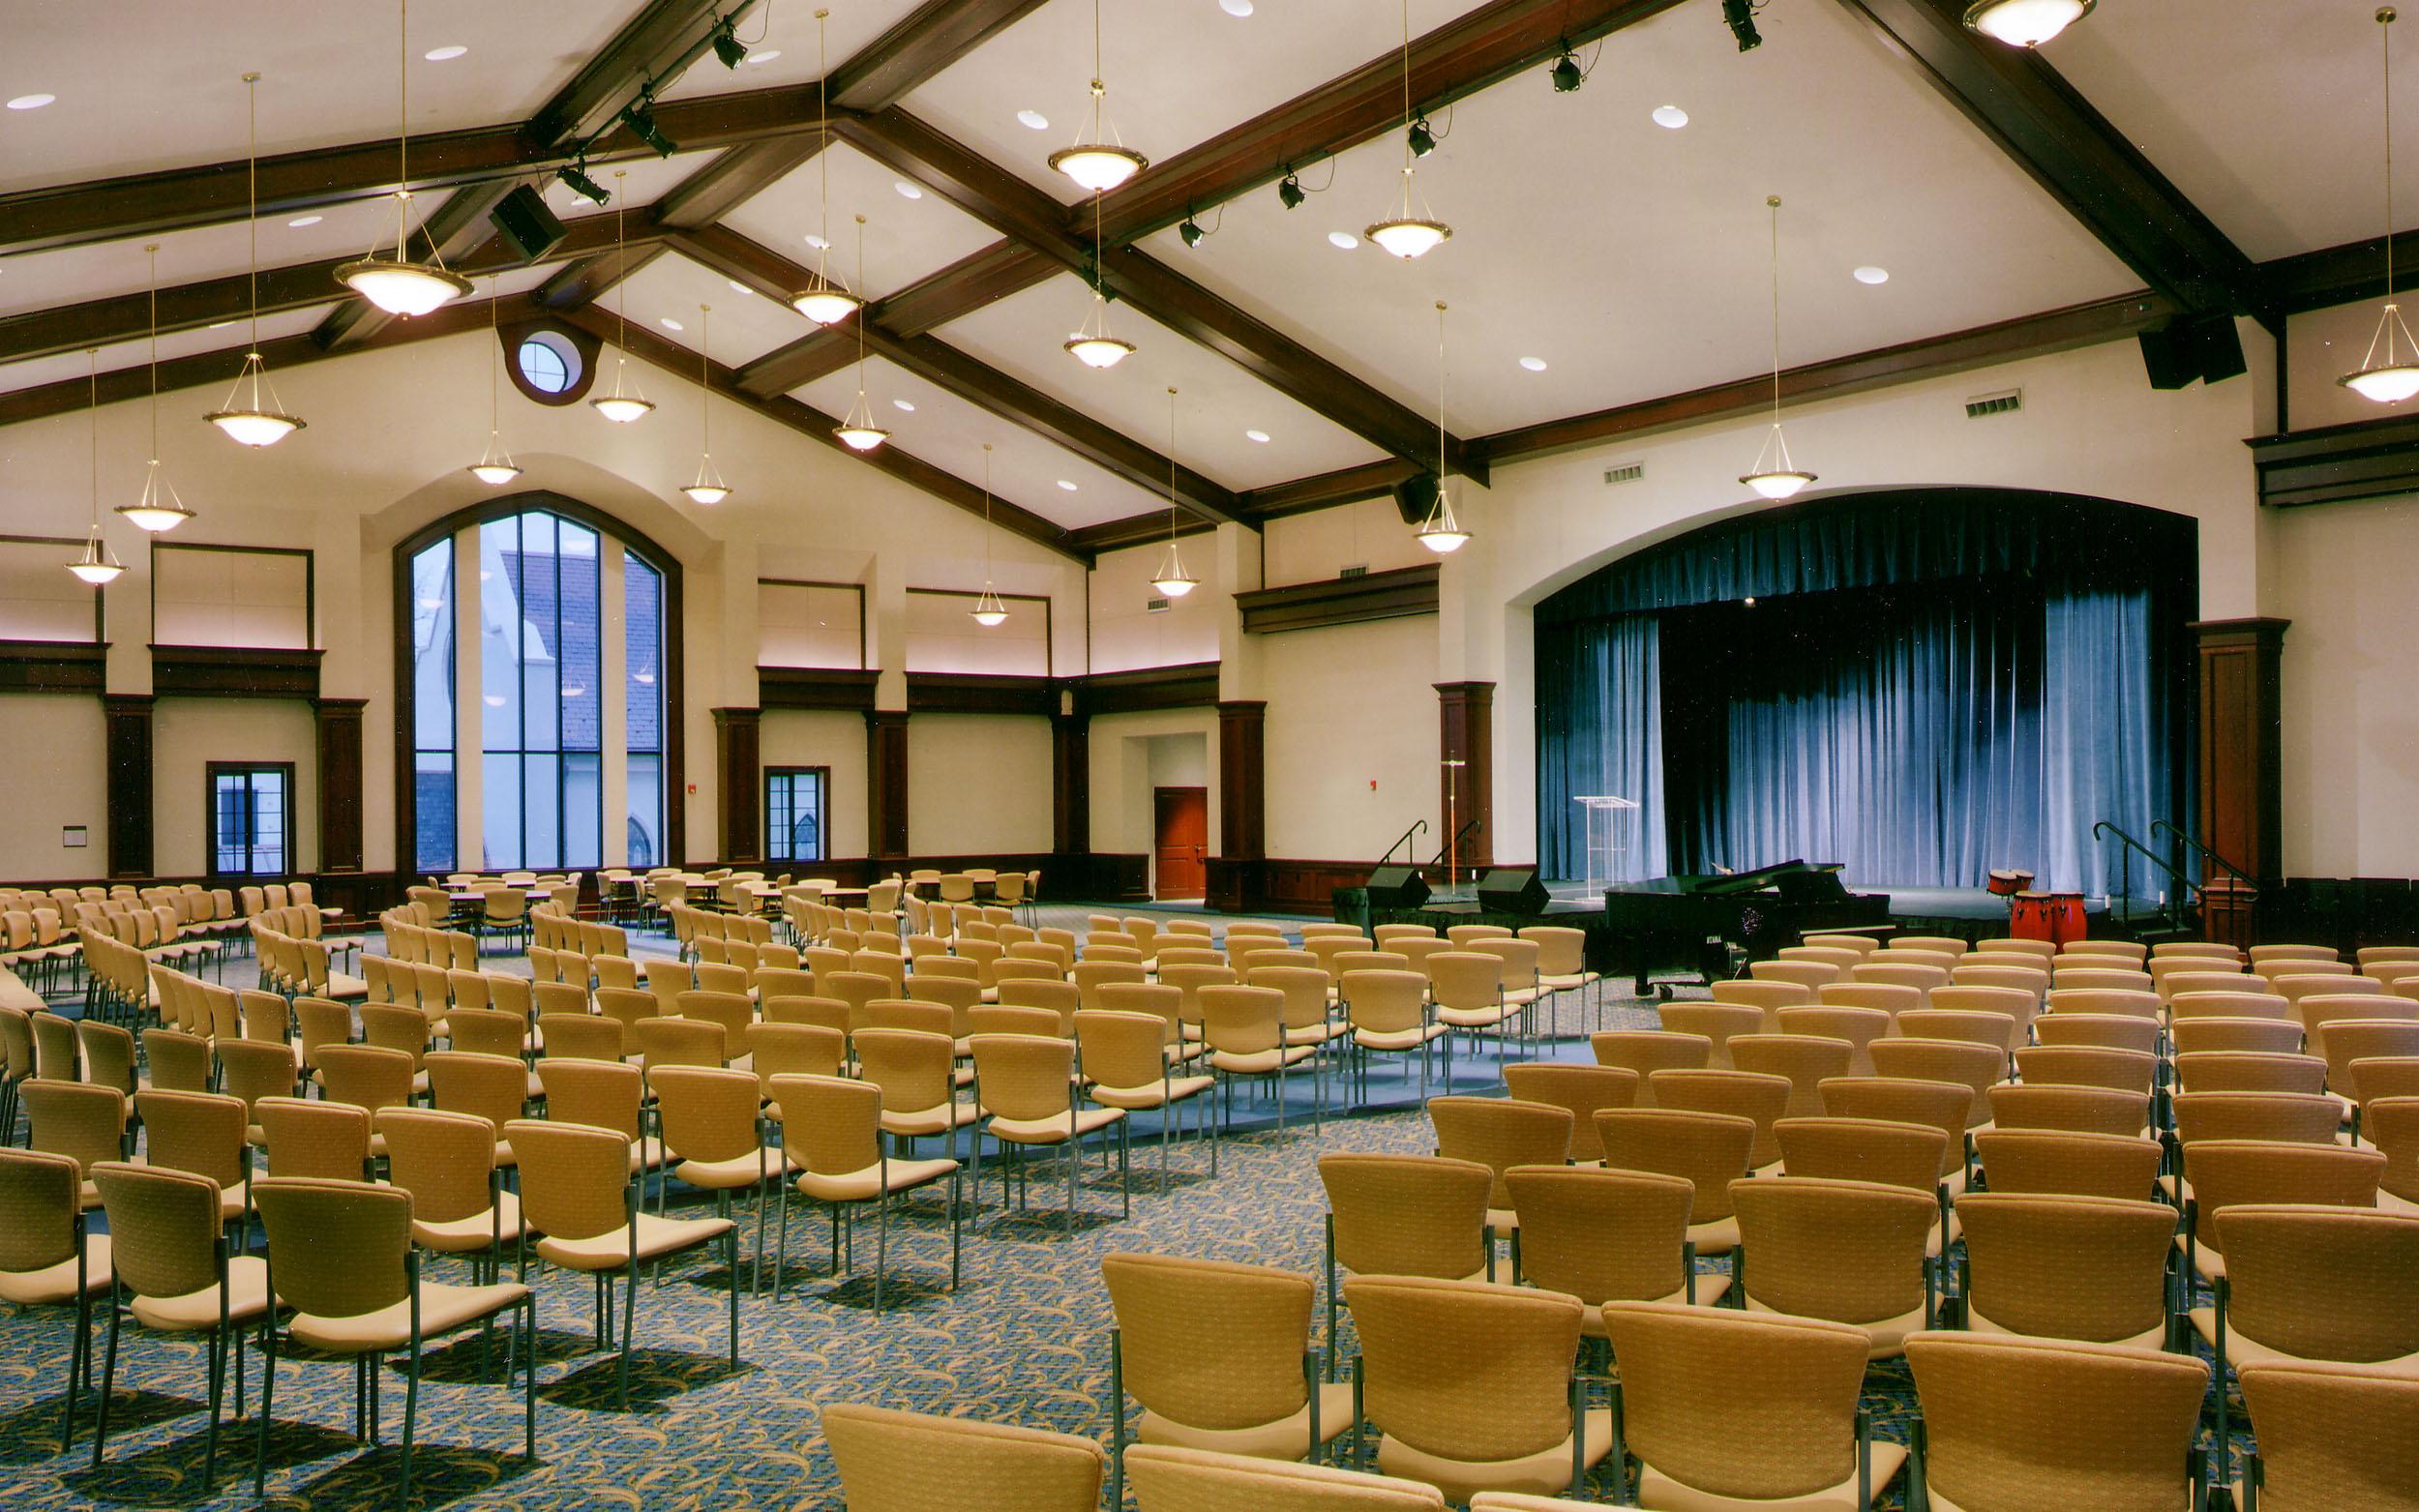 Myers Park United Methodist Church